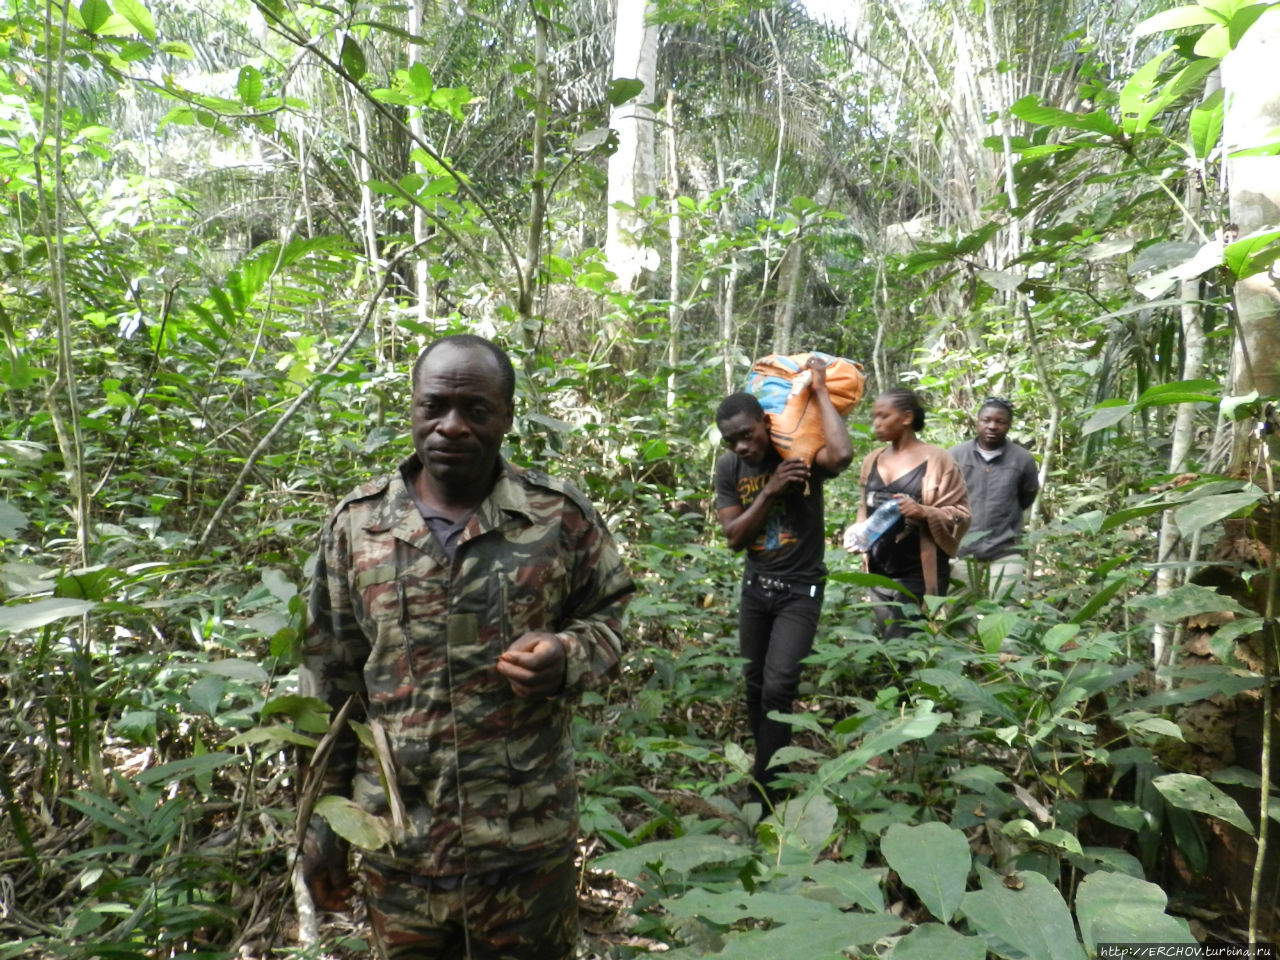 Камерун. Ч — 17. Пигмеи Бака и заповедник Джа Центральный регион, Камерун